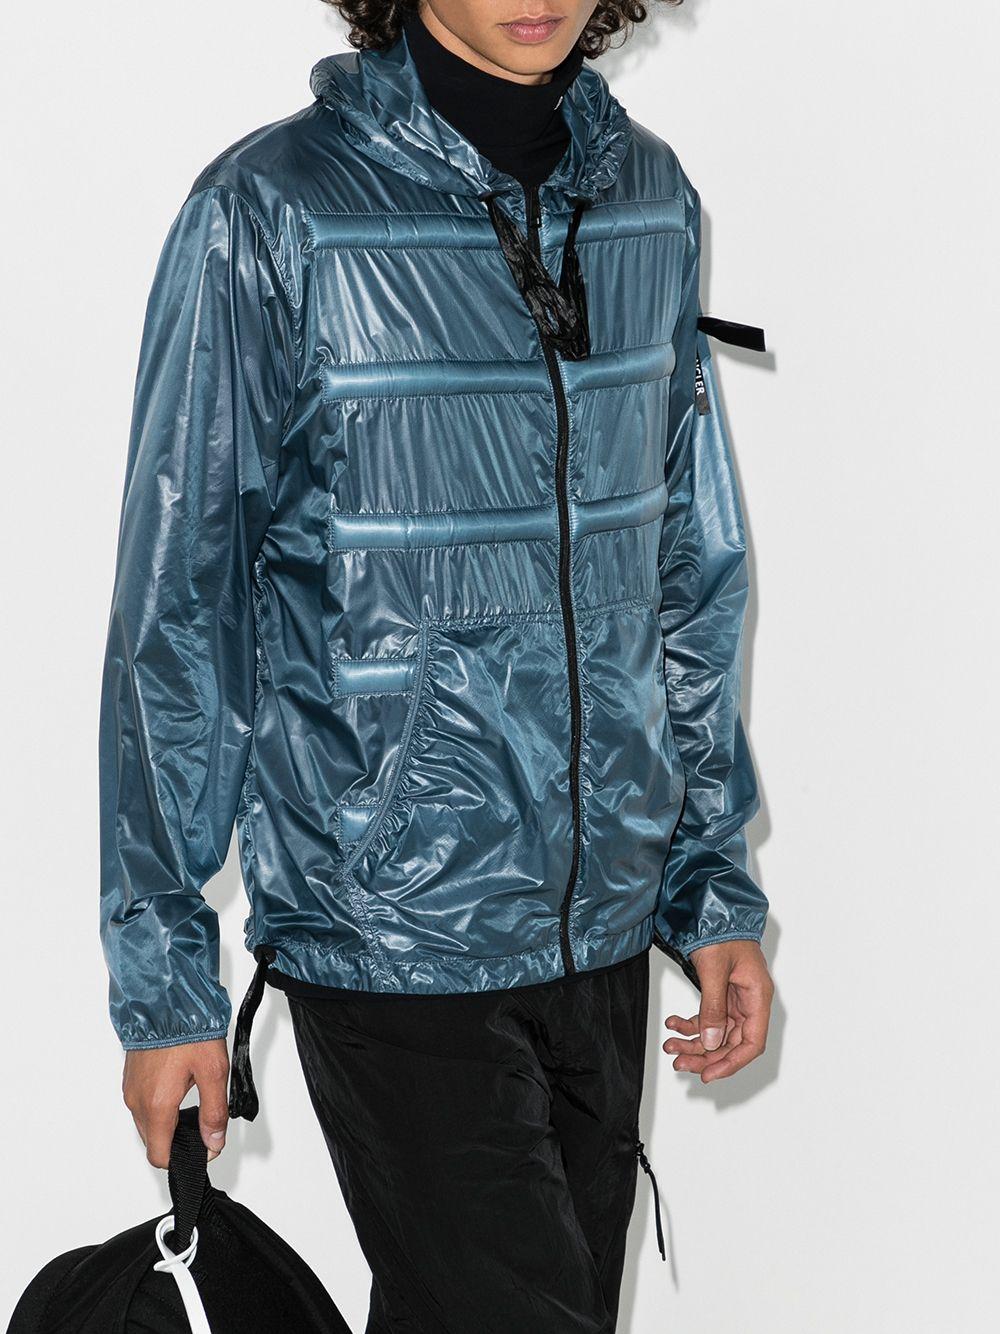 Teal shell Moncler Genius x Craig Green Peeve hooded down jacket  MONCLER GENIUS |  | PEEVE 1A702-10-C0624720